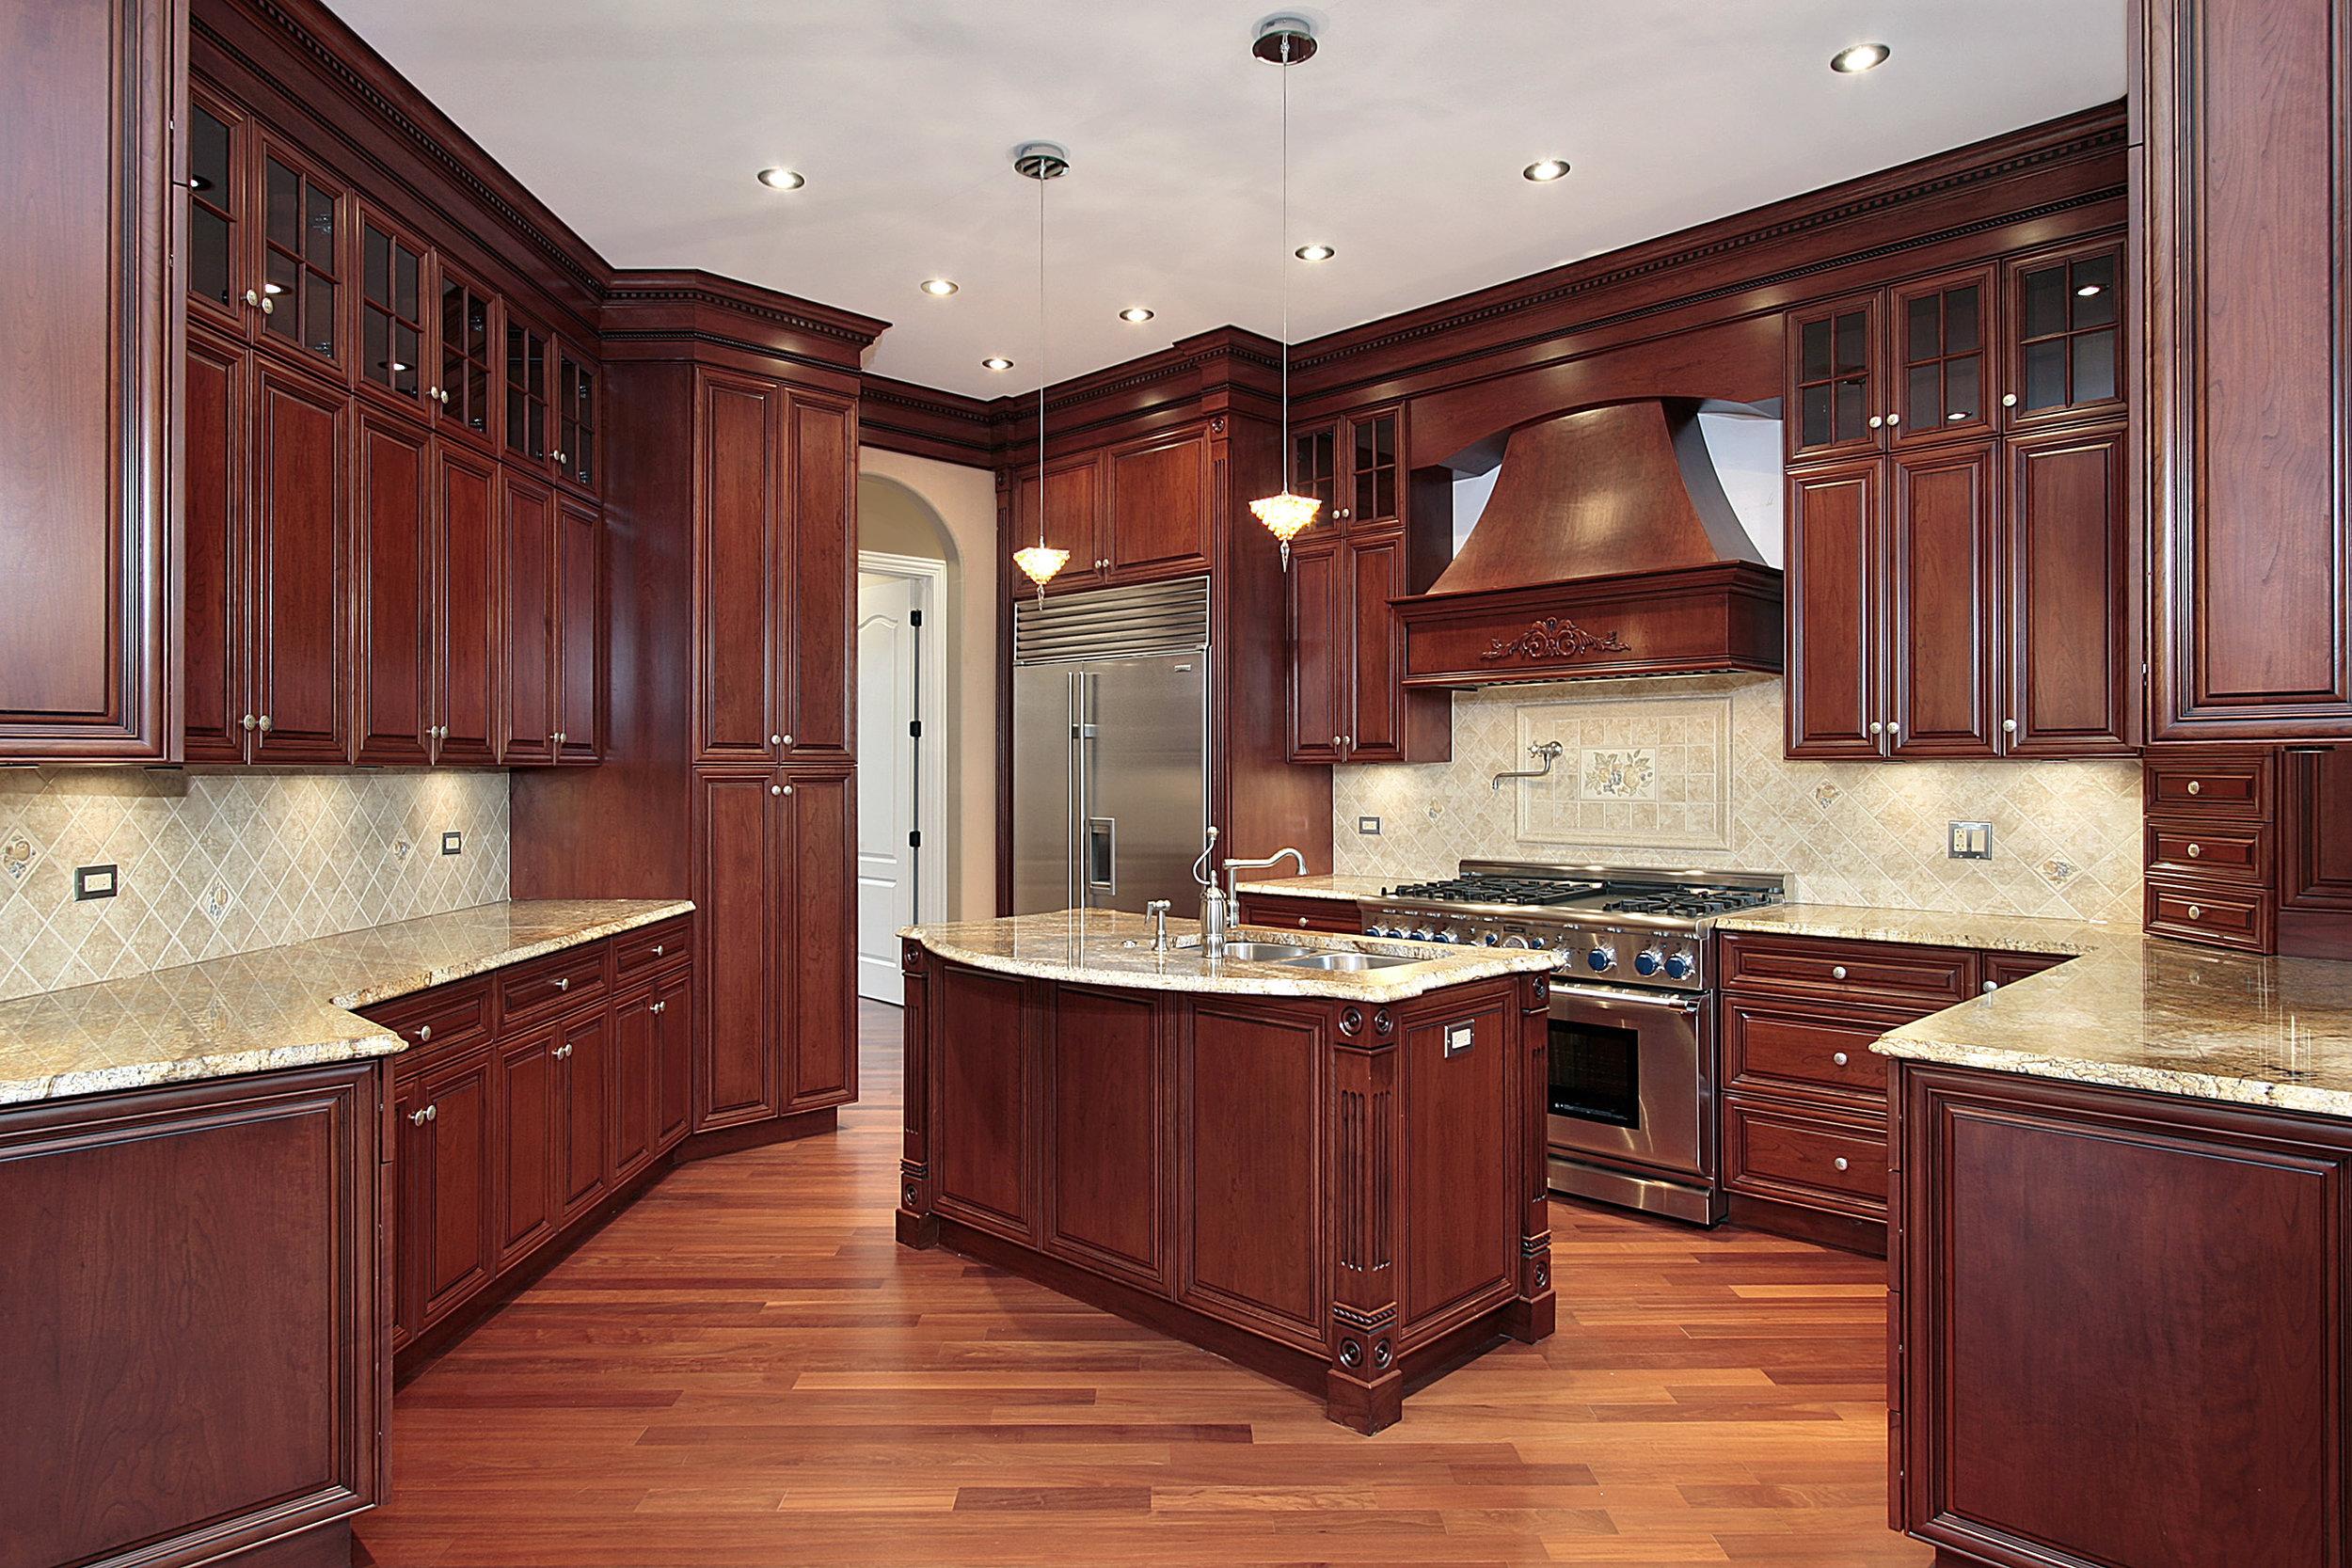 bigstock-Kitchen-With-Cherry-Wood-Cabin-6361576.jpg